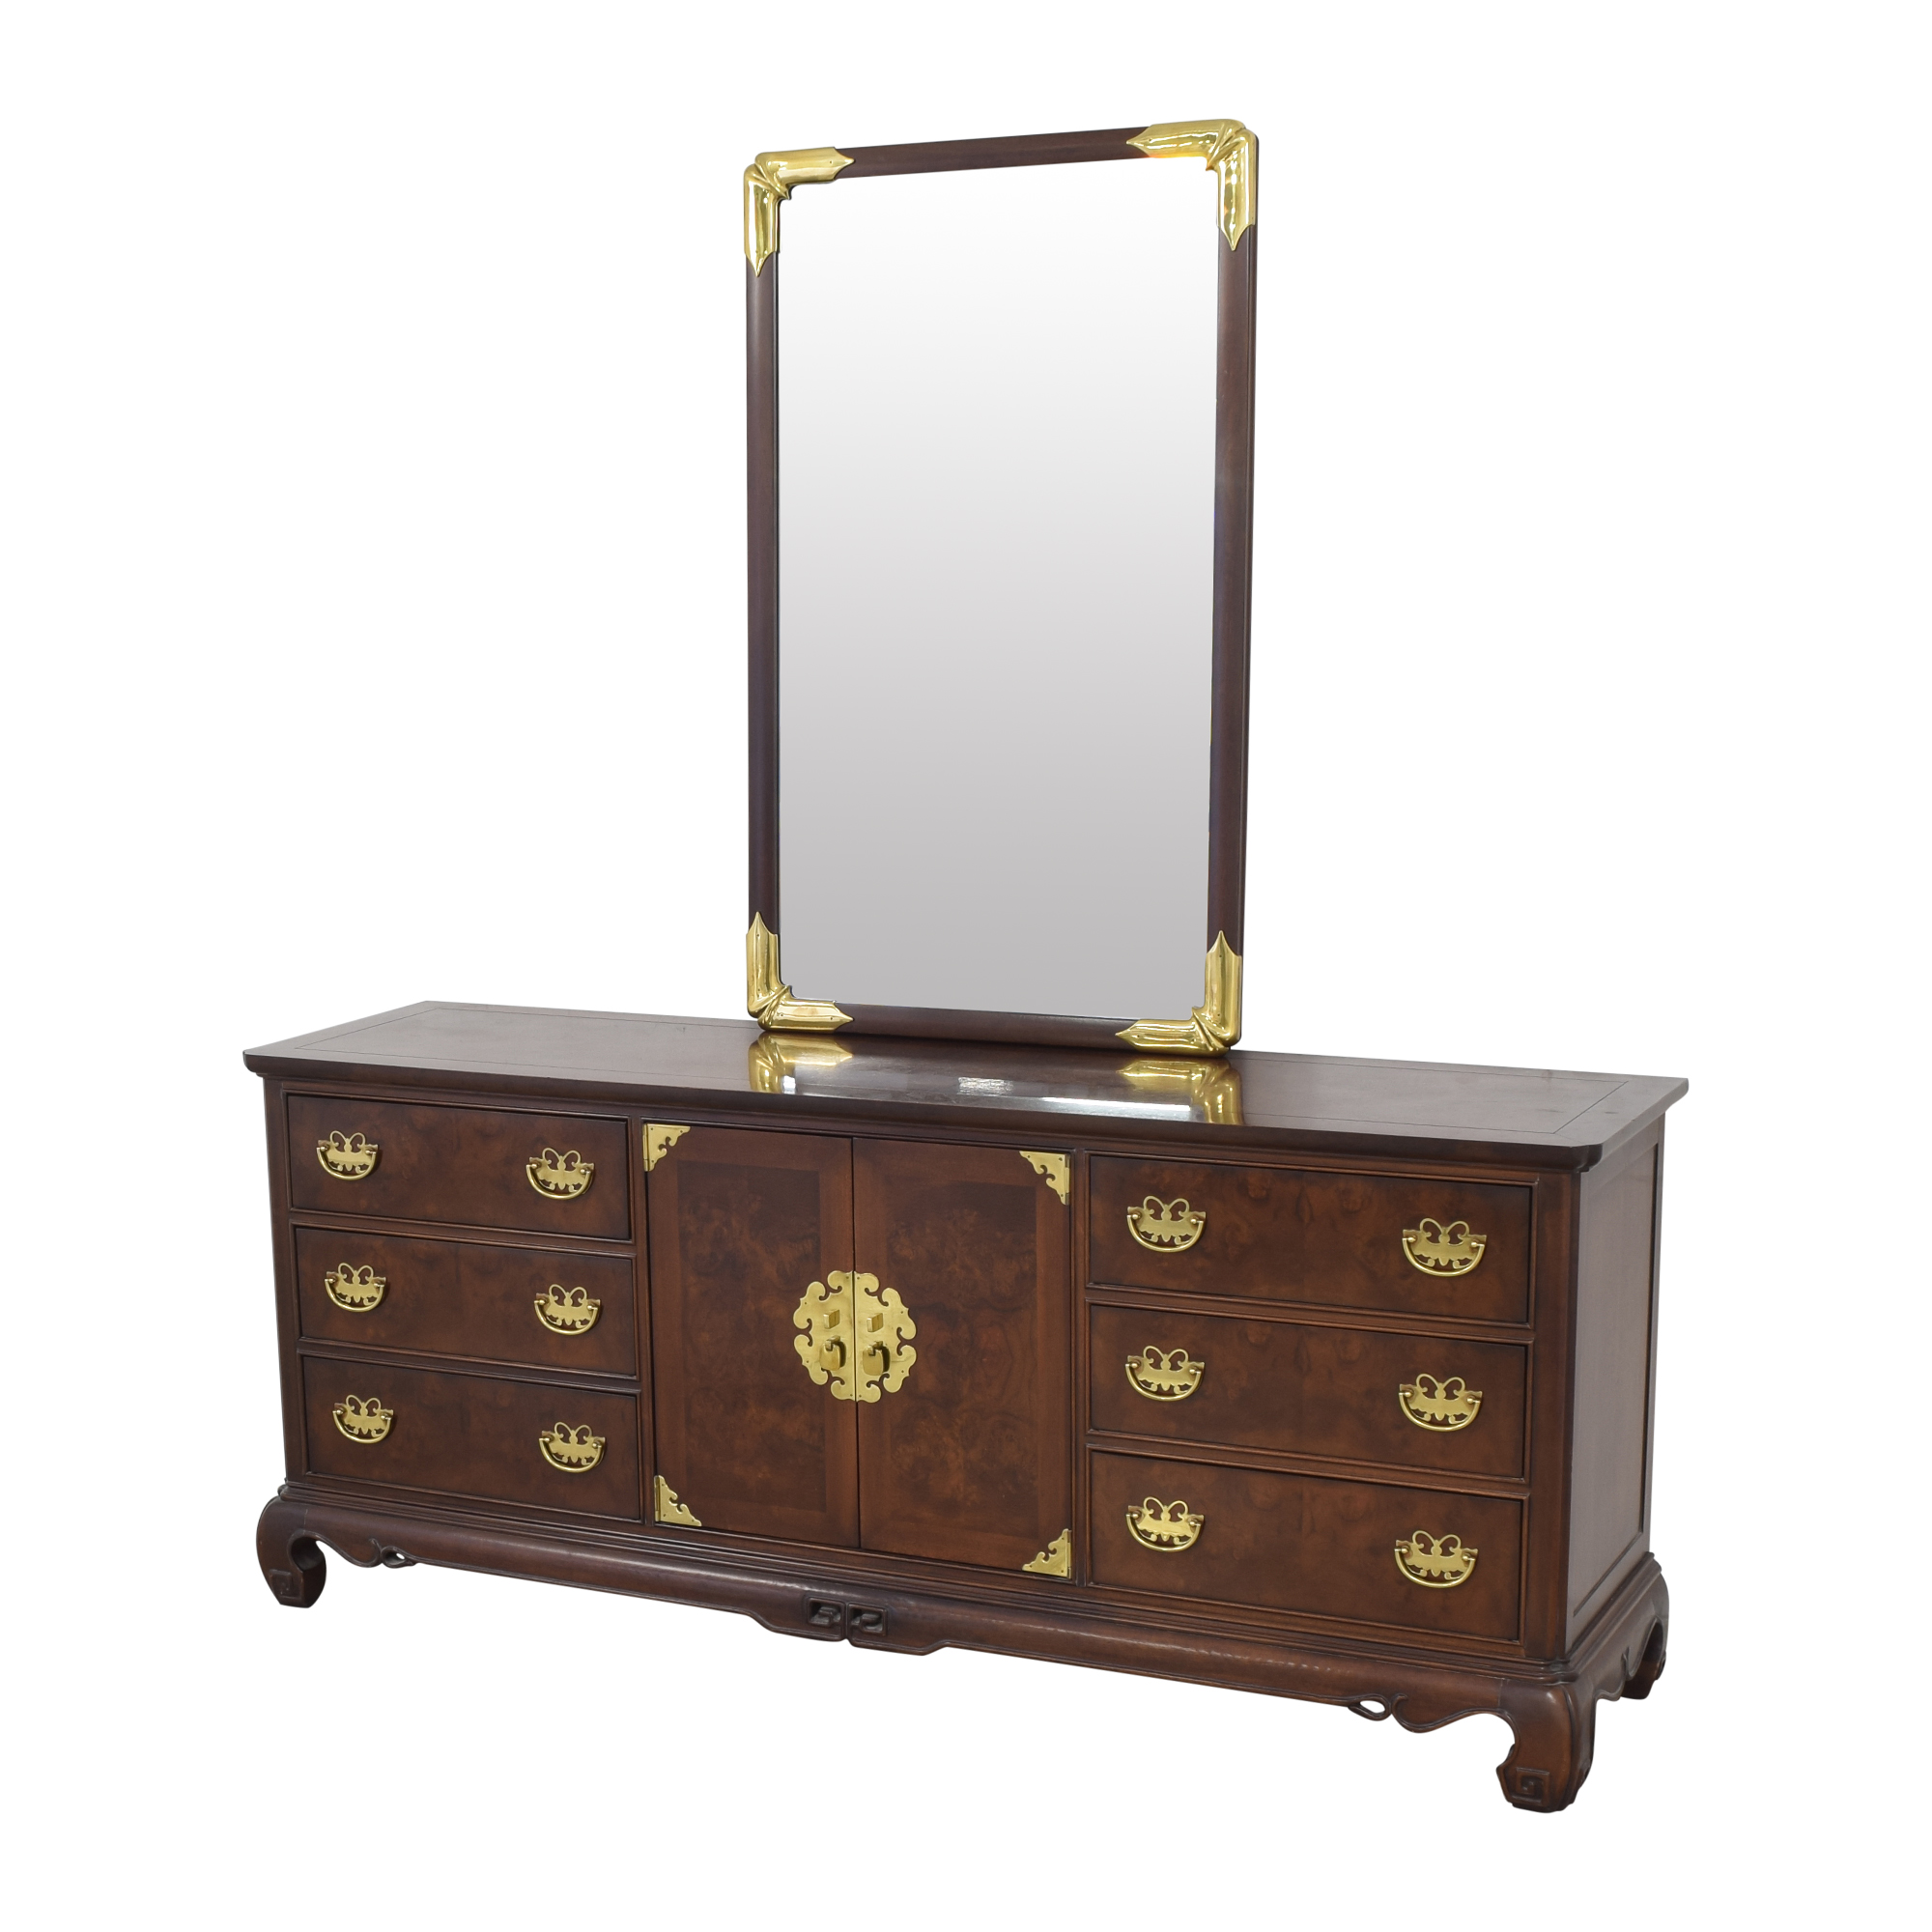 Heritage Henredon Heritage Henredon Dresser with Mirror ma